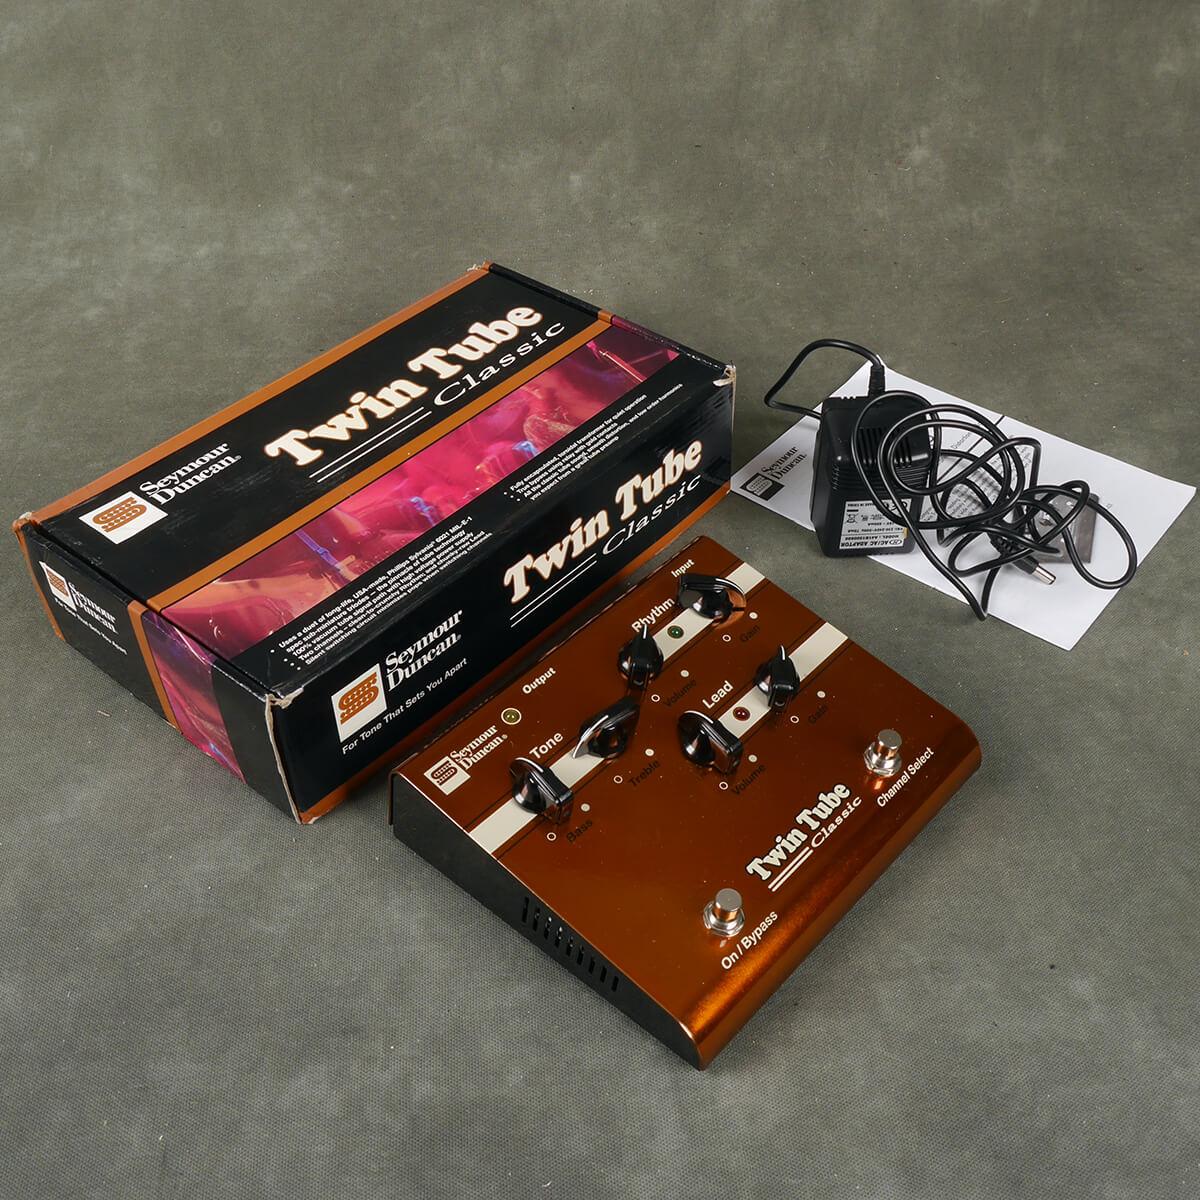 Seymour Duncan Twin Tube Classic Pre-amp FX Pedal w/Box & PSU - 2nd Hand